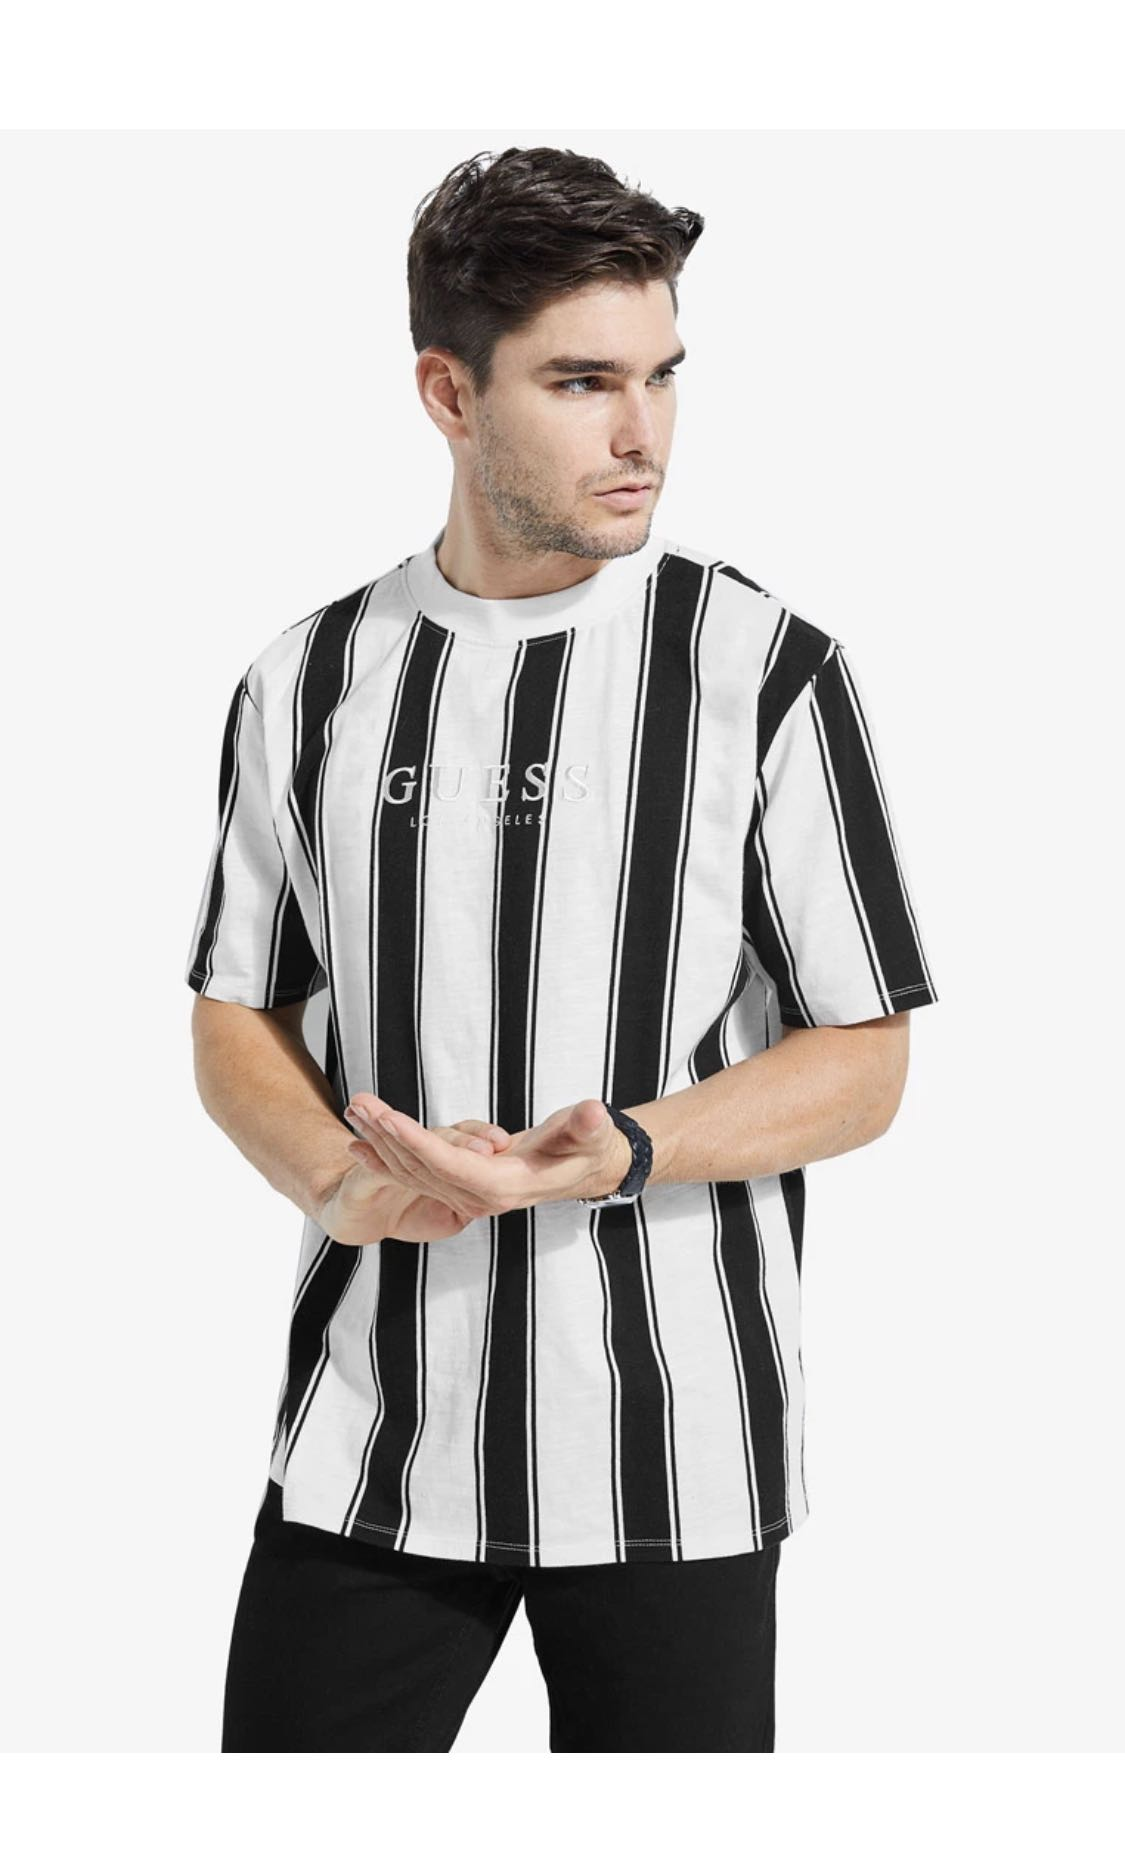 84b5ba4c4201 Guess walden stripes tee/tshirt, Men's Fashion, Clothes, Tops on Carousell